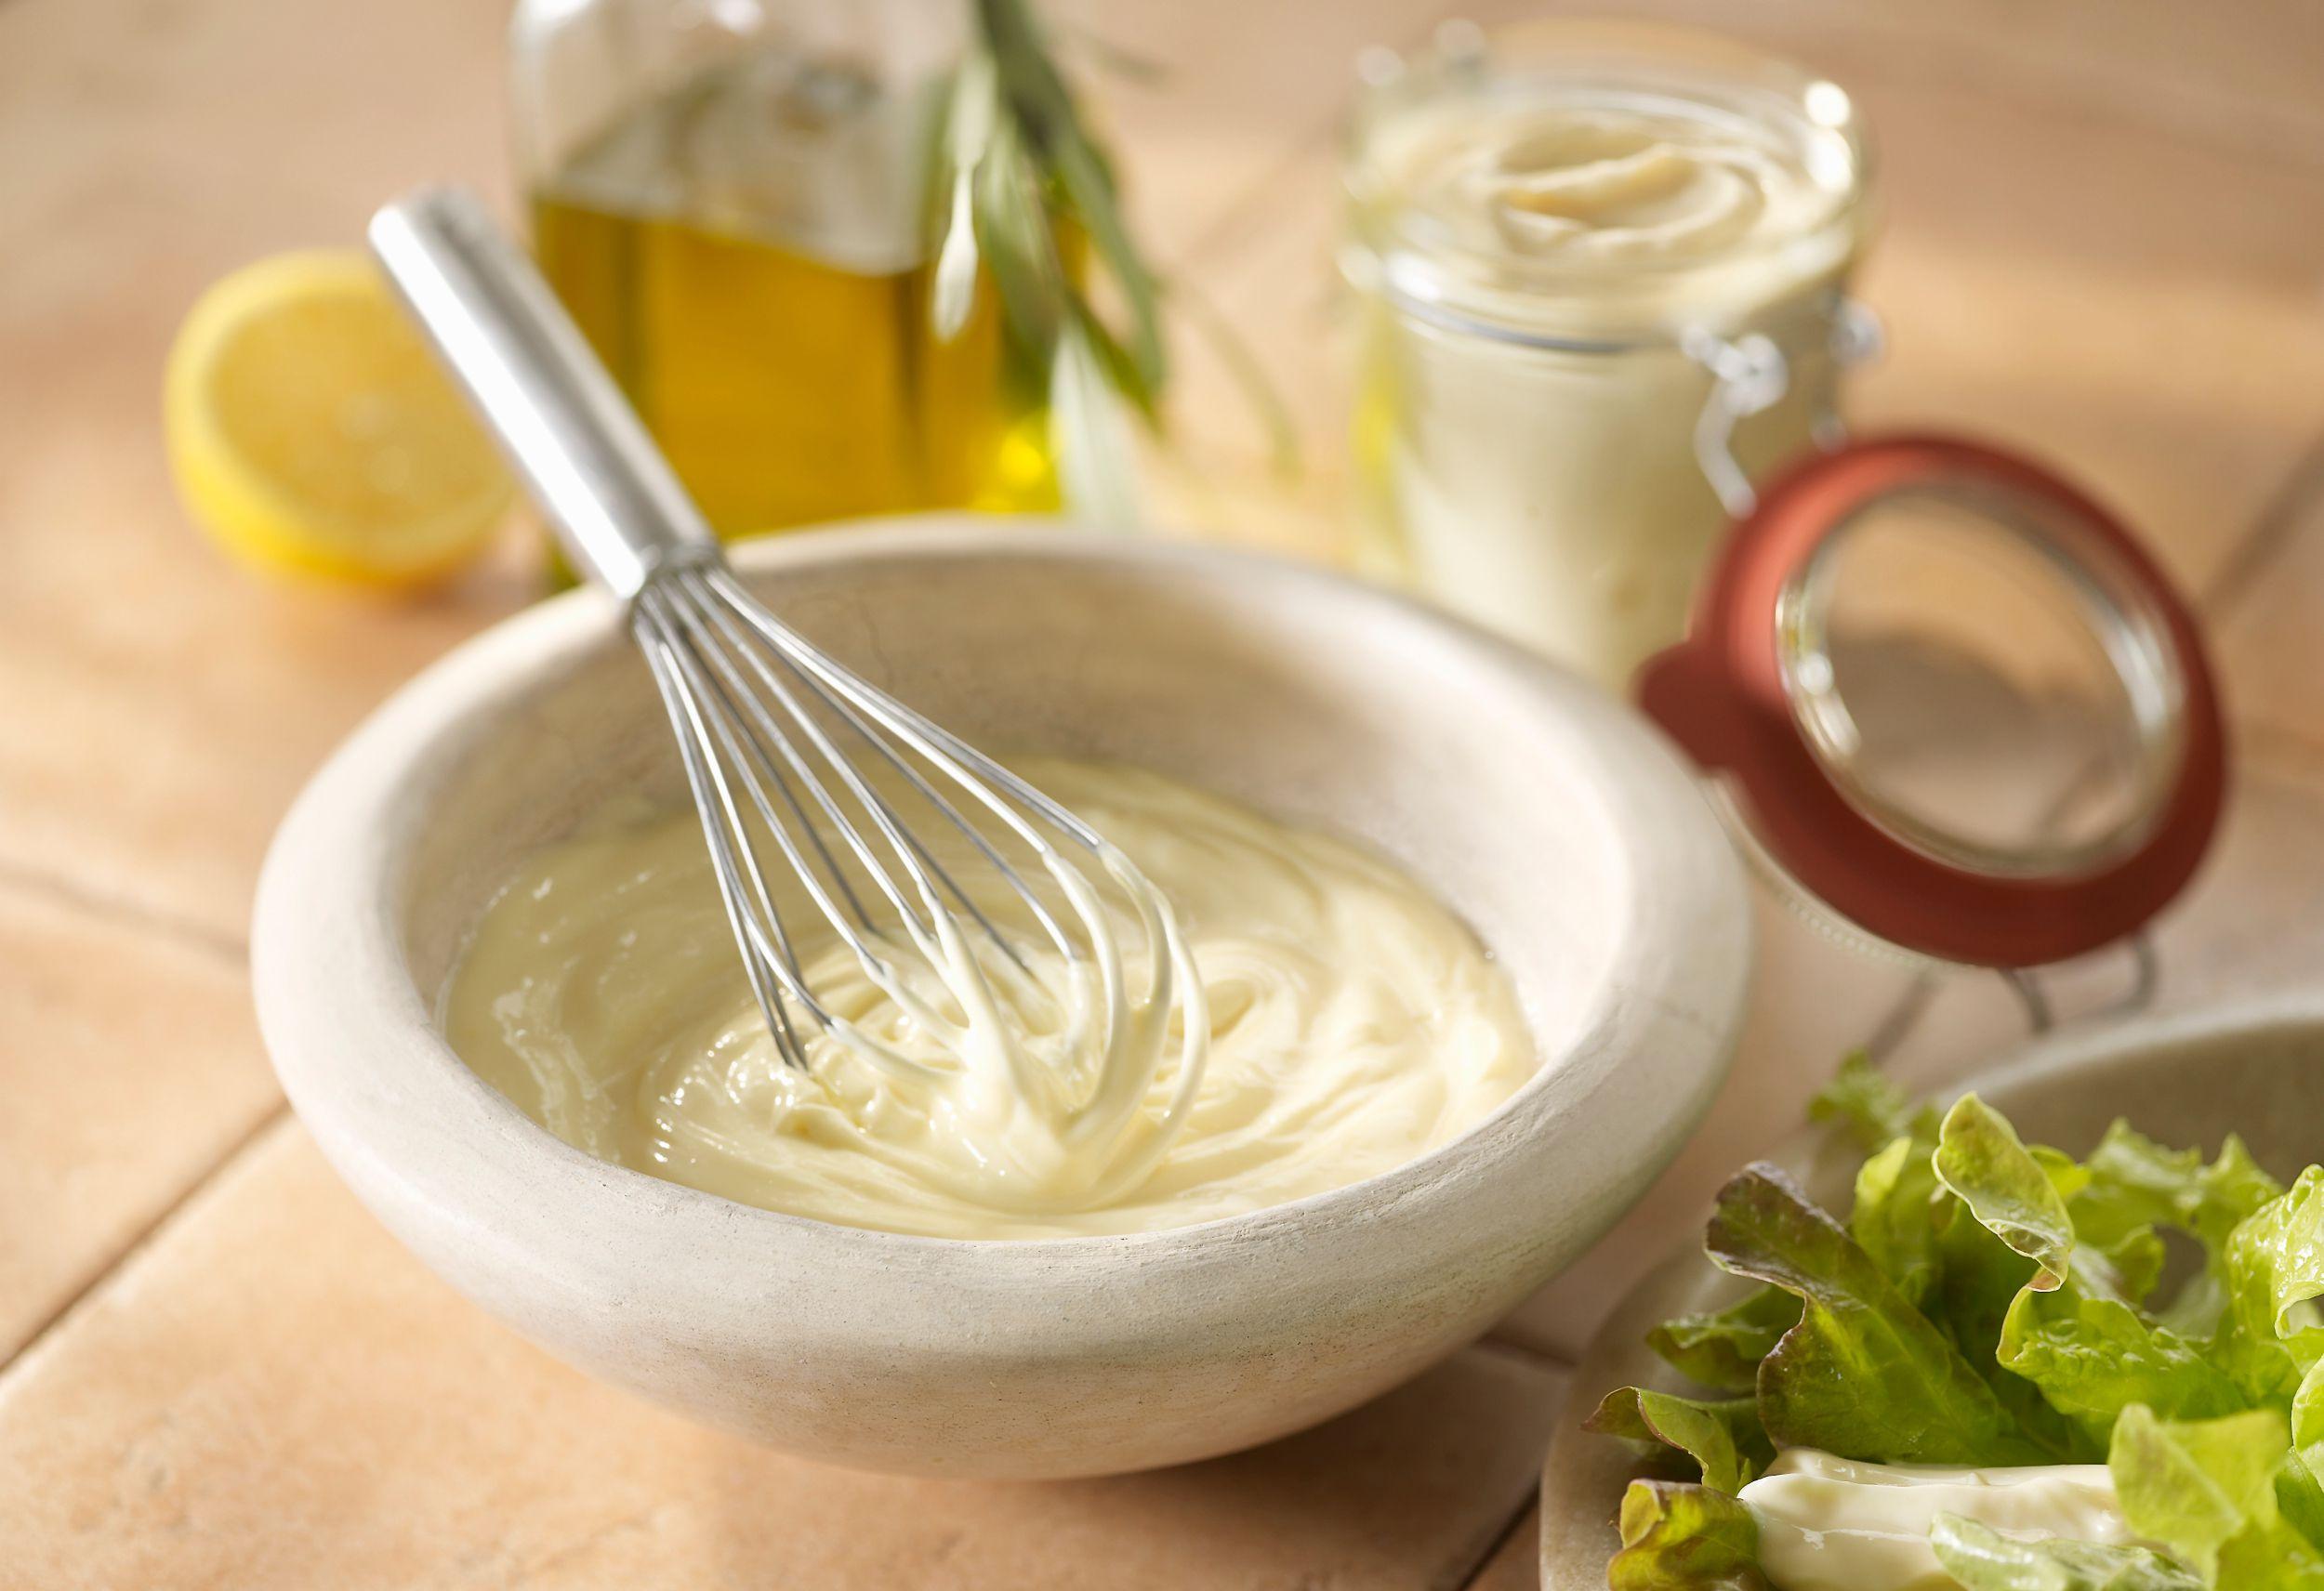 Basic Homemade Mayonnaise Recipe